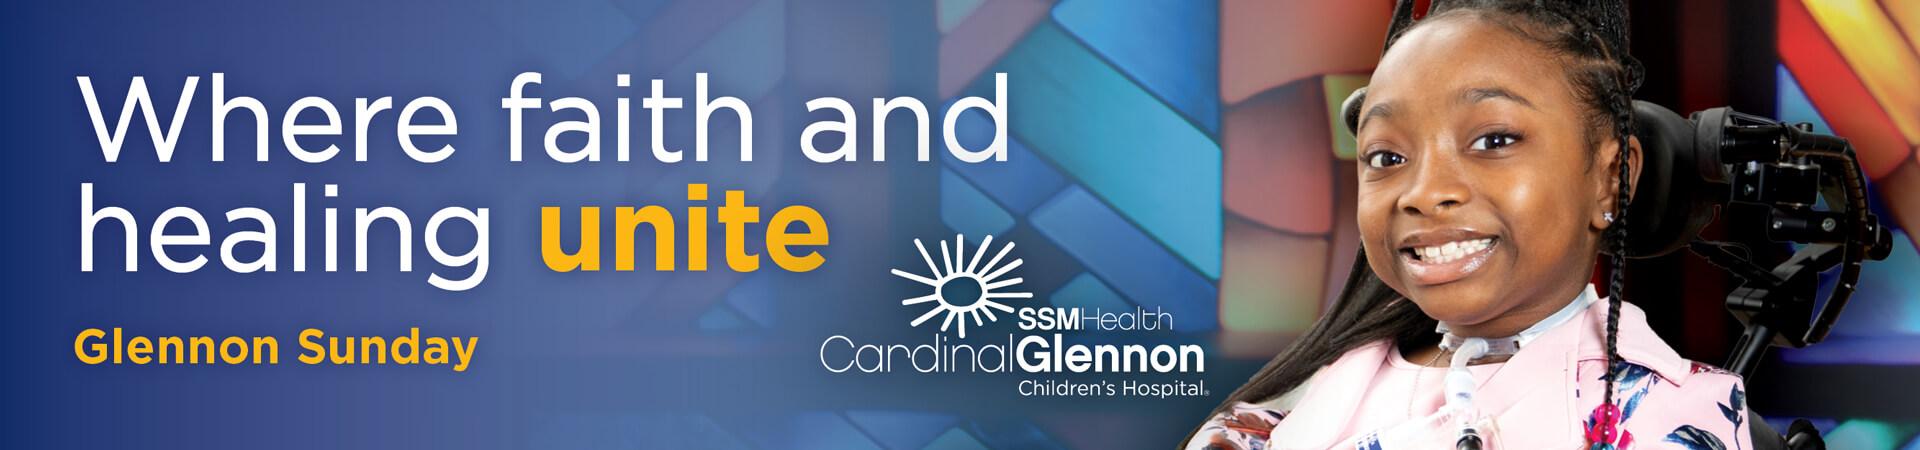 Glennon Sunday - Where Faith and Healing Unite, Cardinal Glennon patient Sariah